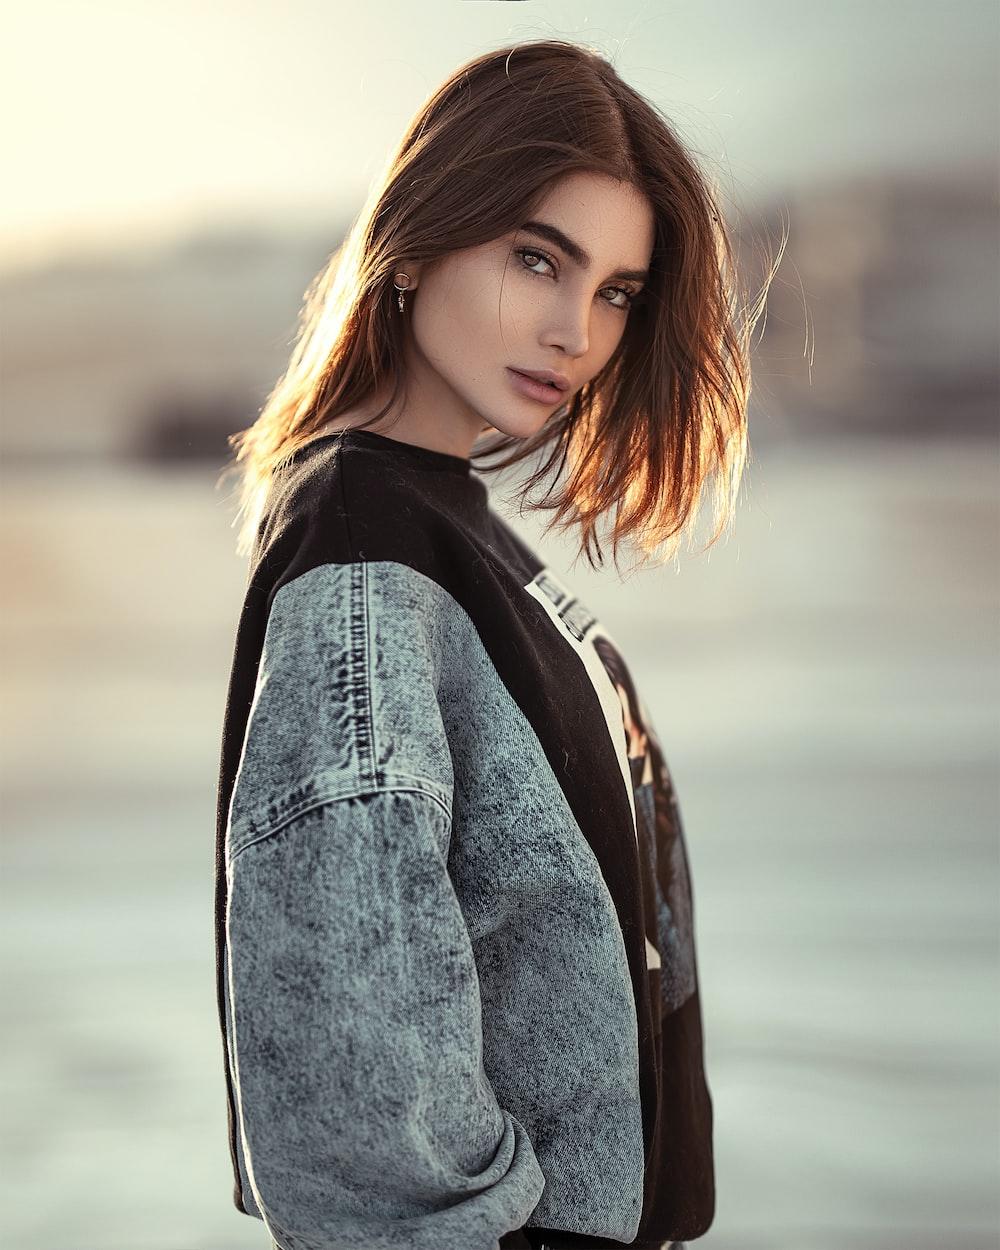 woman wearing gray jacket